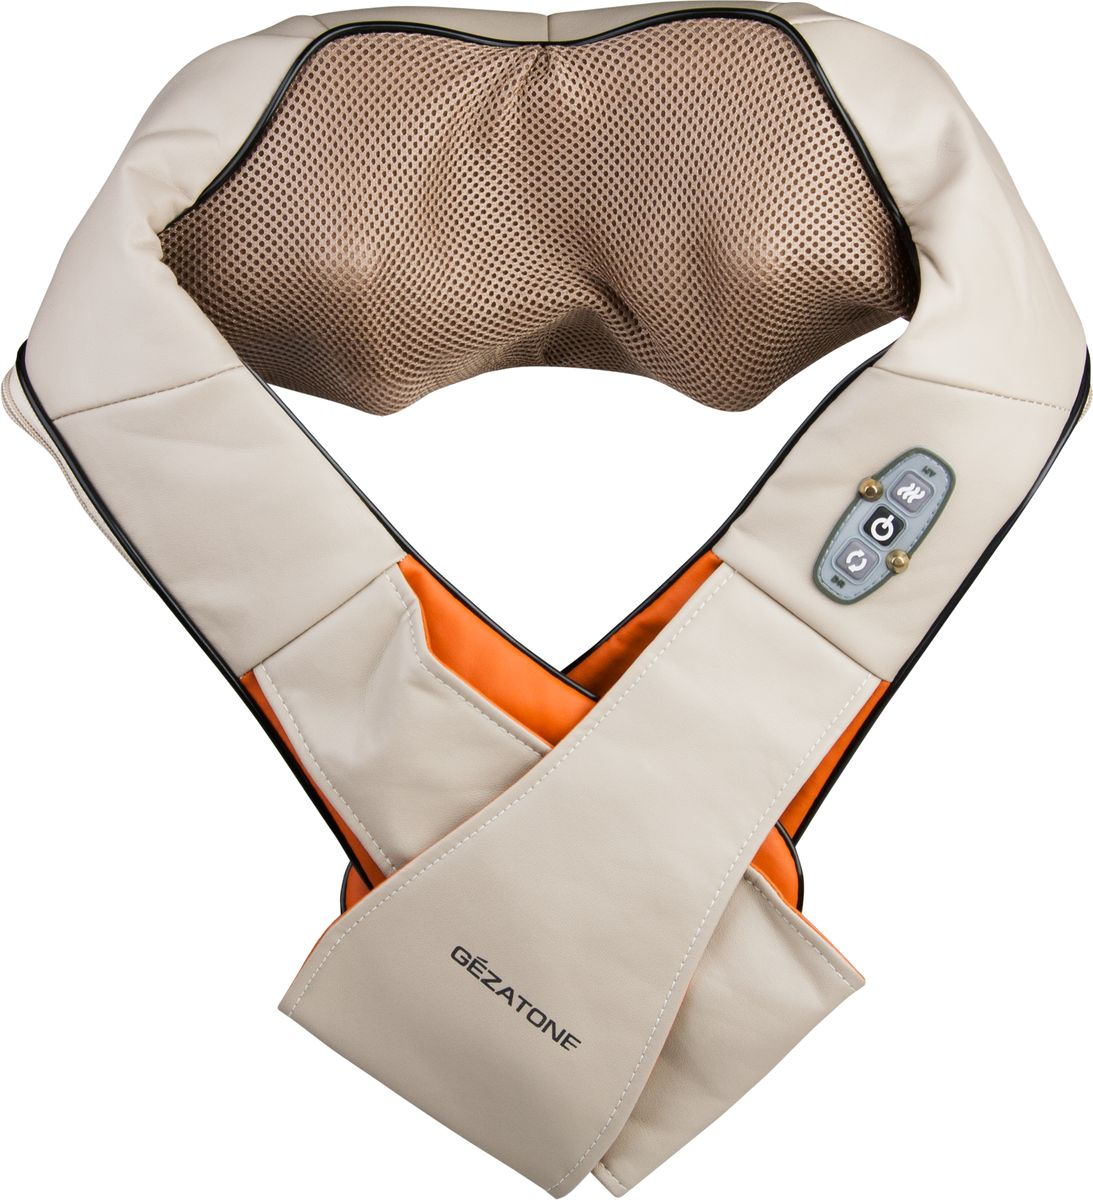 Gezatone Массажер роликовый для шеи и тела Irelax AMG395 массажер аппарат gezatone роликовый массажер миостимулятор для лица gezatone m270 page 6